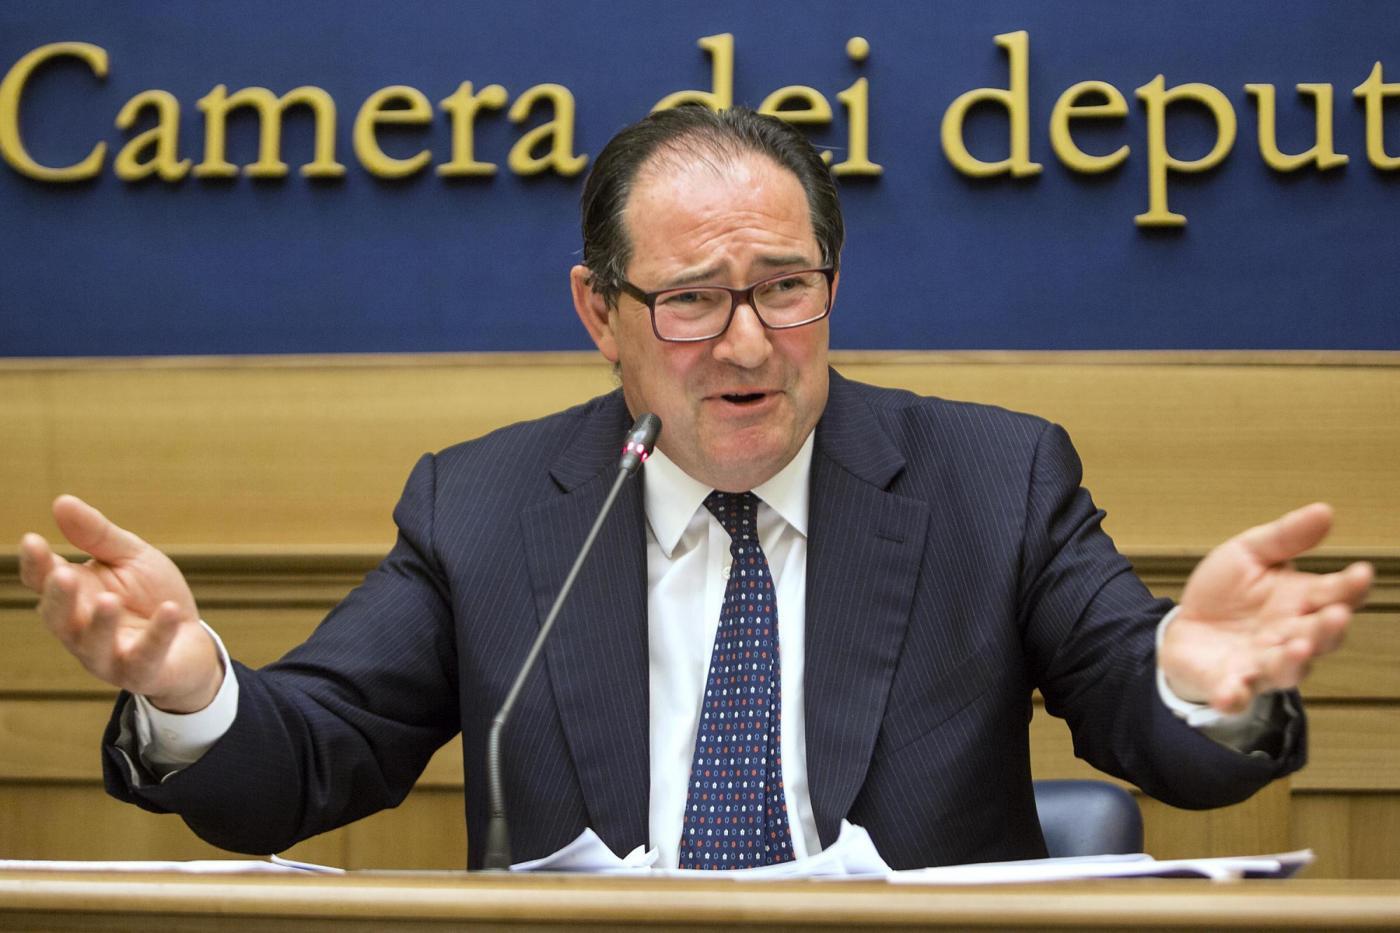 Conferenza stampa di Giancarlo Galan